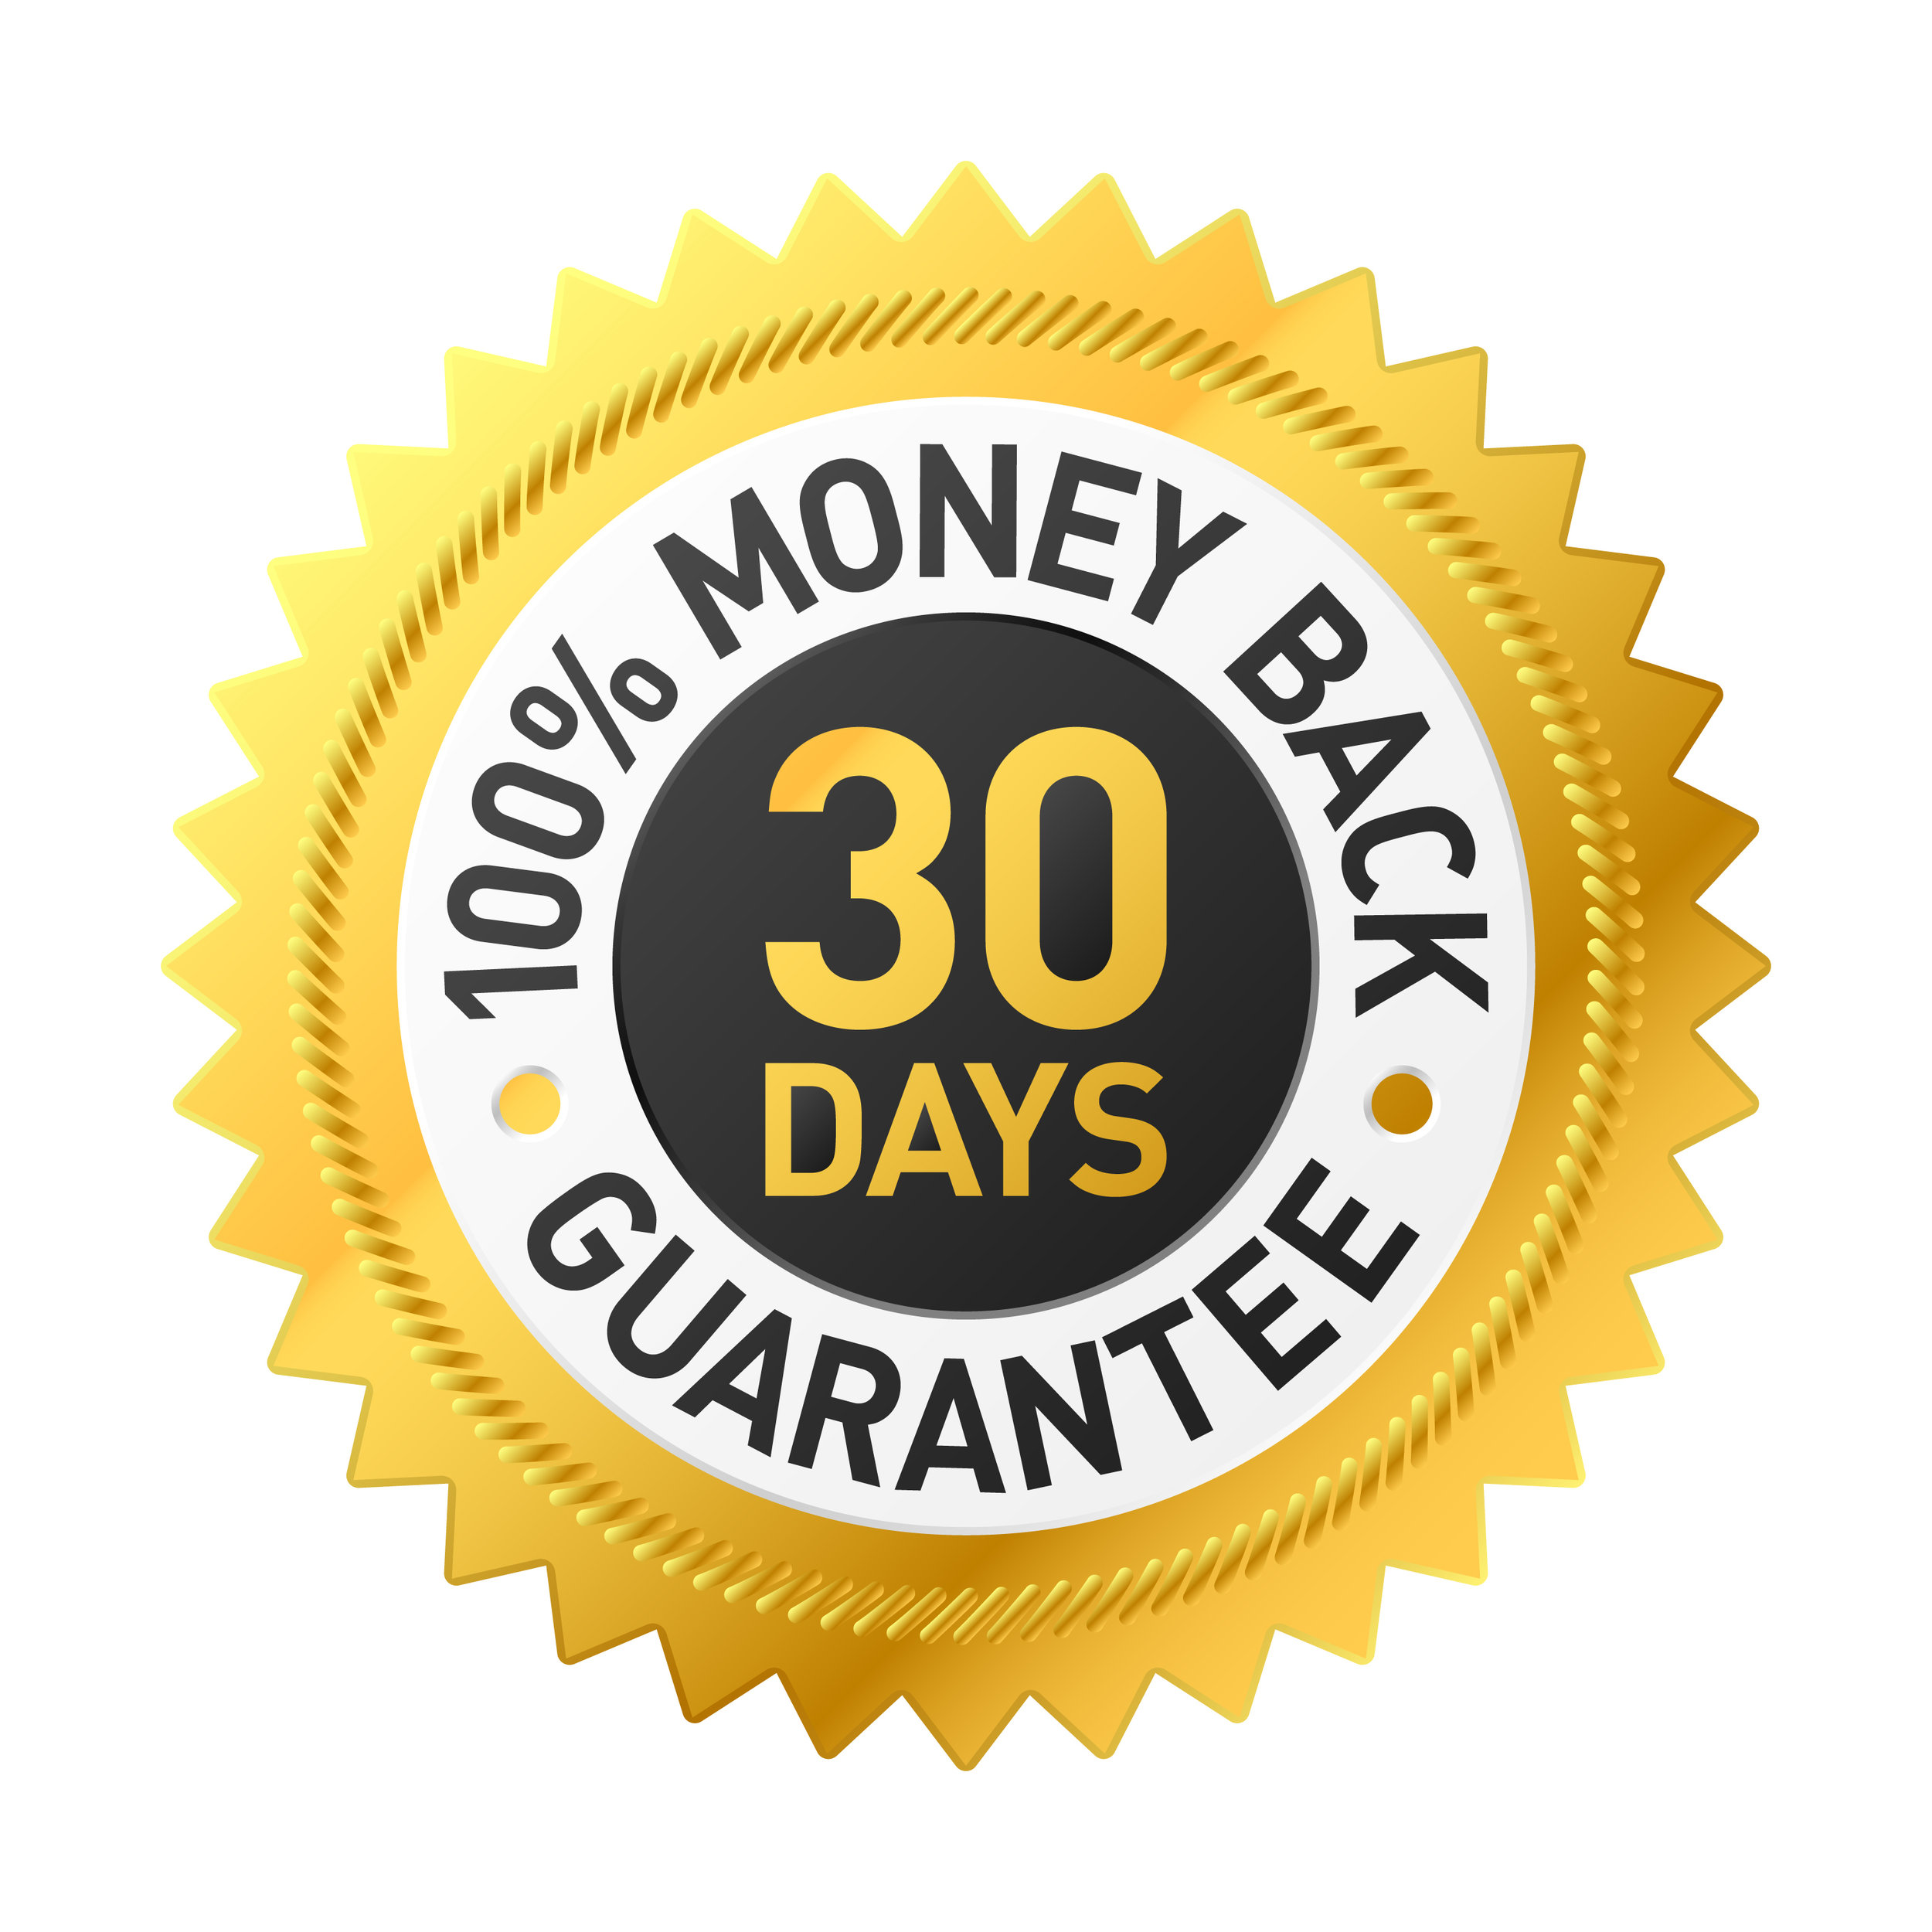 bigstock---days-money-back-guarantee-l-10112201.jpg